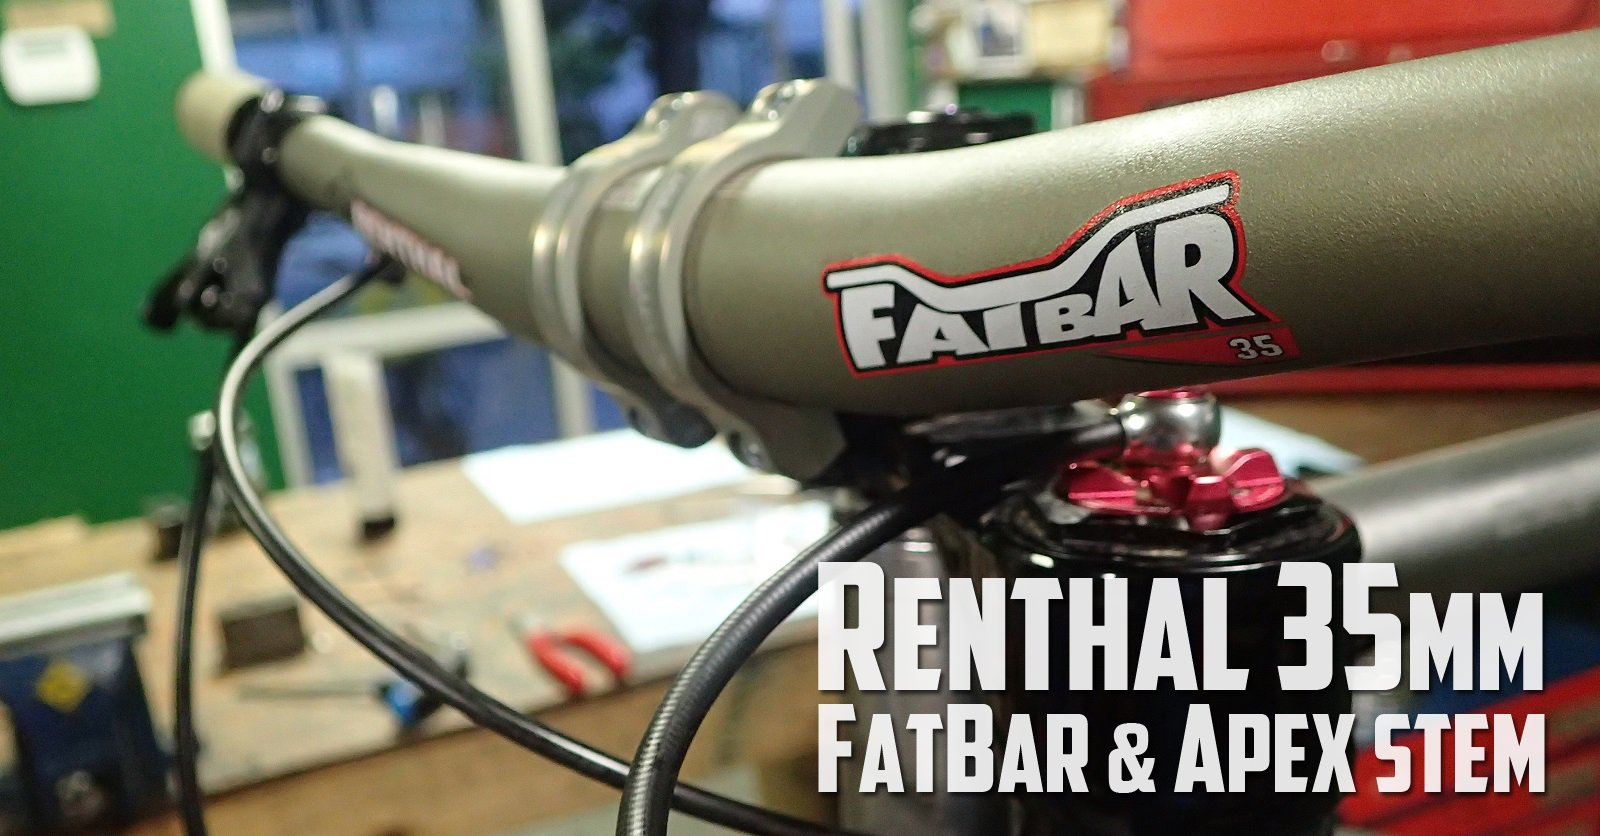 Renthal 35mm Fatbar Apex Stem Review